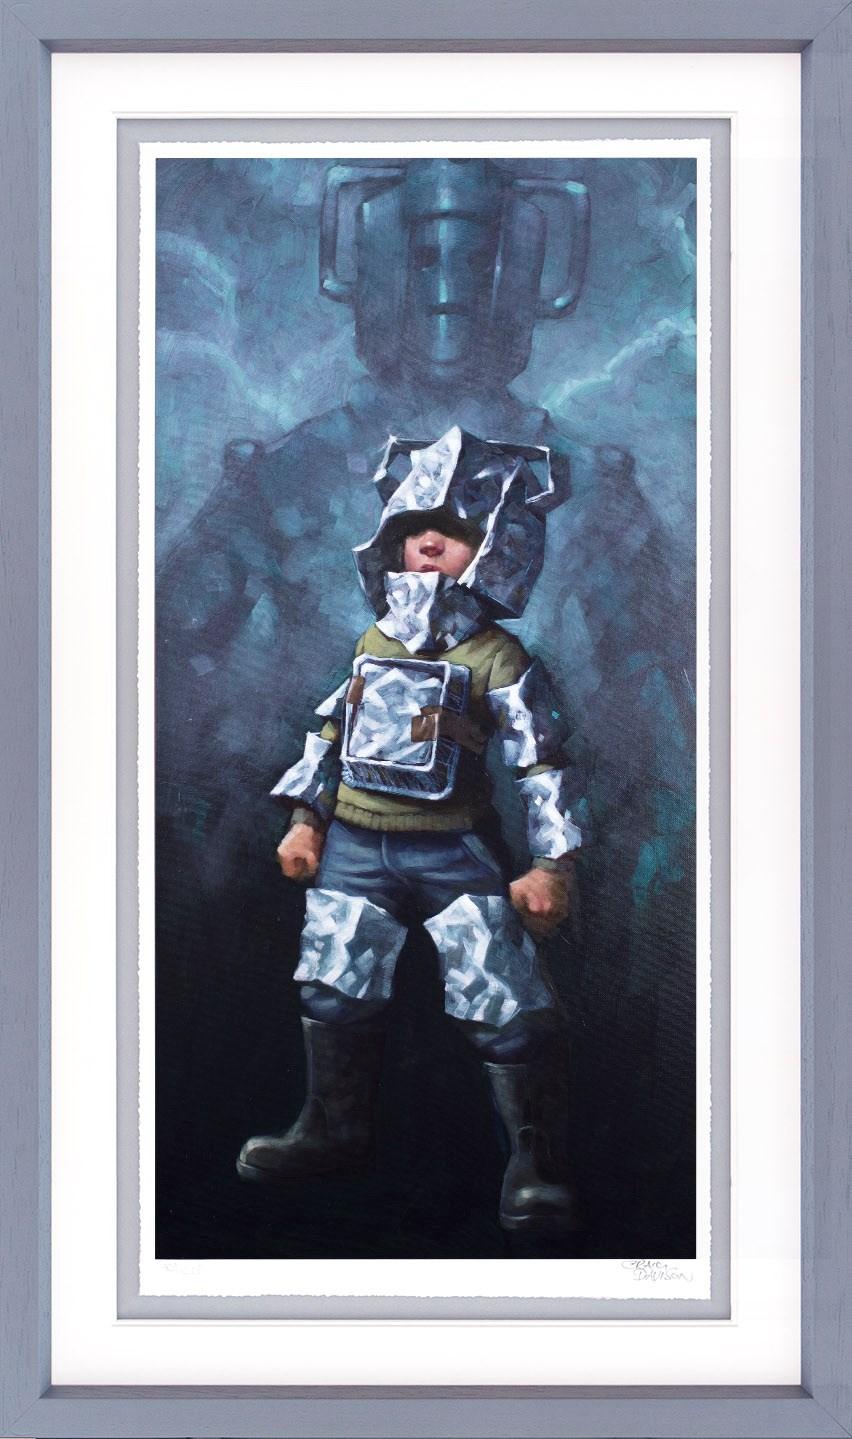 Cyberfan - Framed by Craig Davison